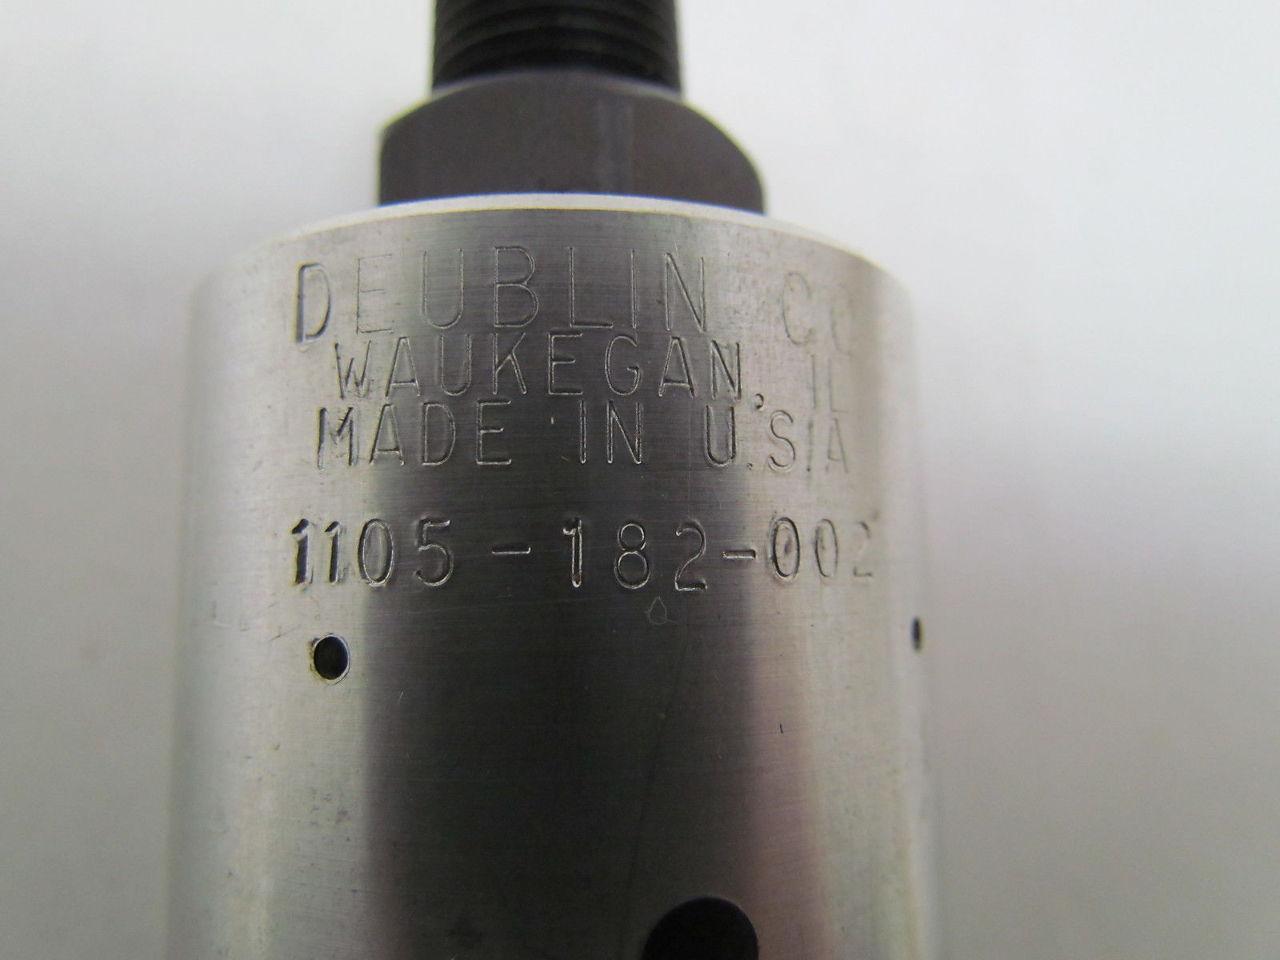 deublin rotary union catalogue pdf